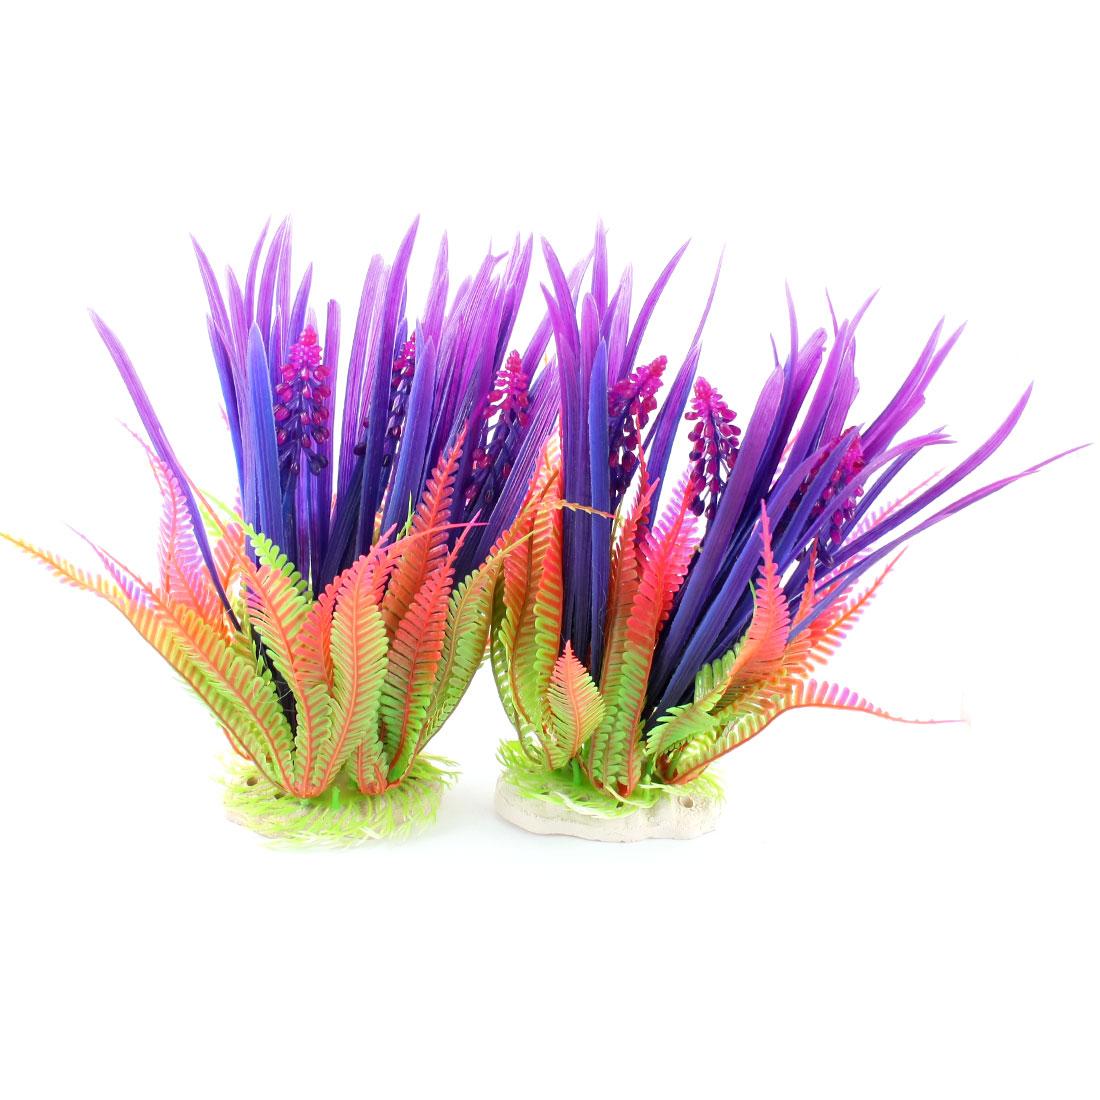 "2 Pcs Aquarium Underwater Landscaping Emulational Colorful Plastic Grass Plant Decor 10"" High"